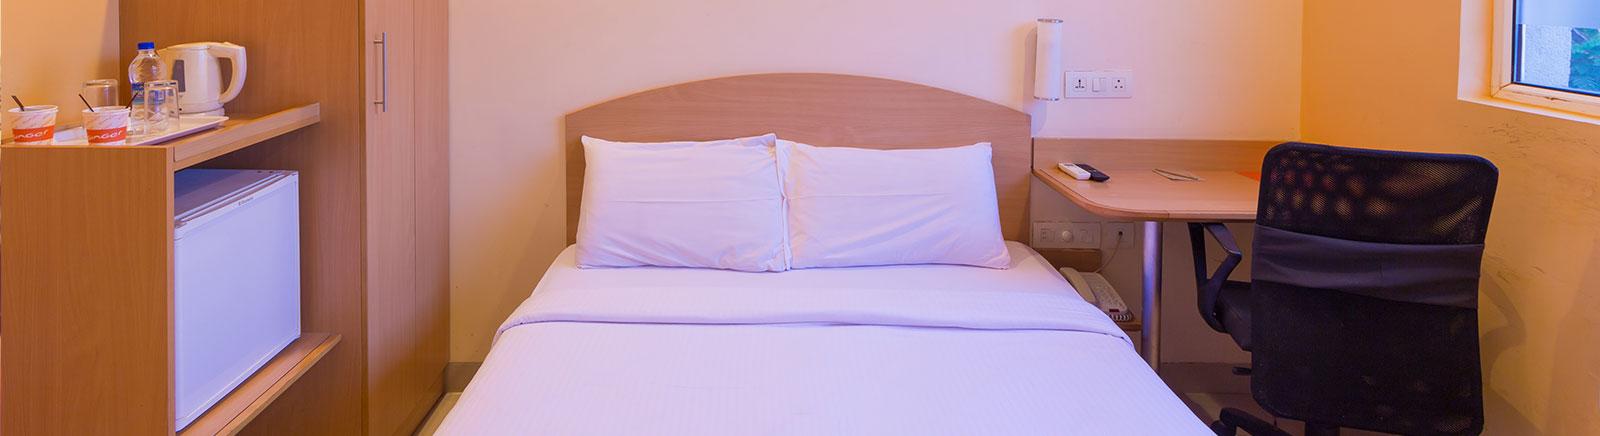 Ginger Pondicherry Hotel Rooms